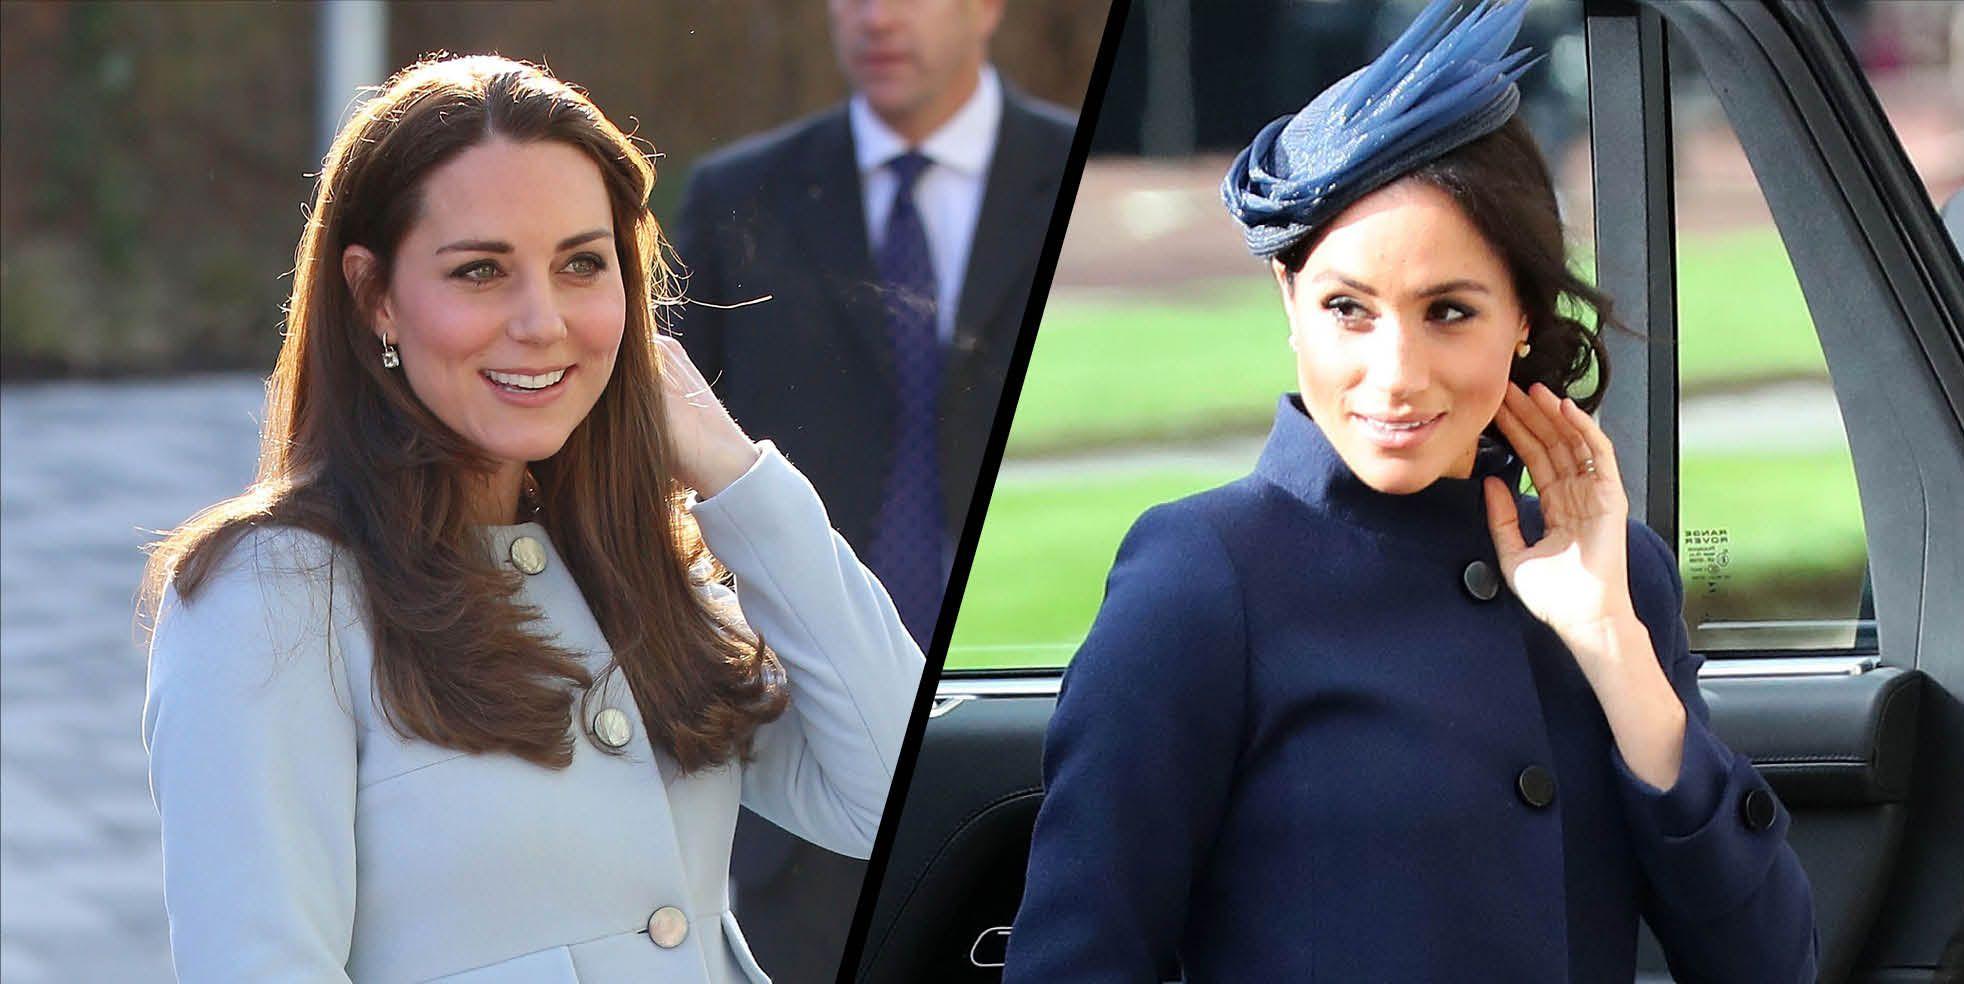 Pregnant royal family style